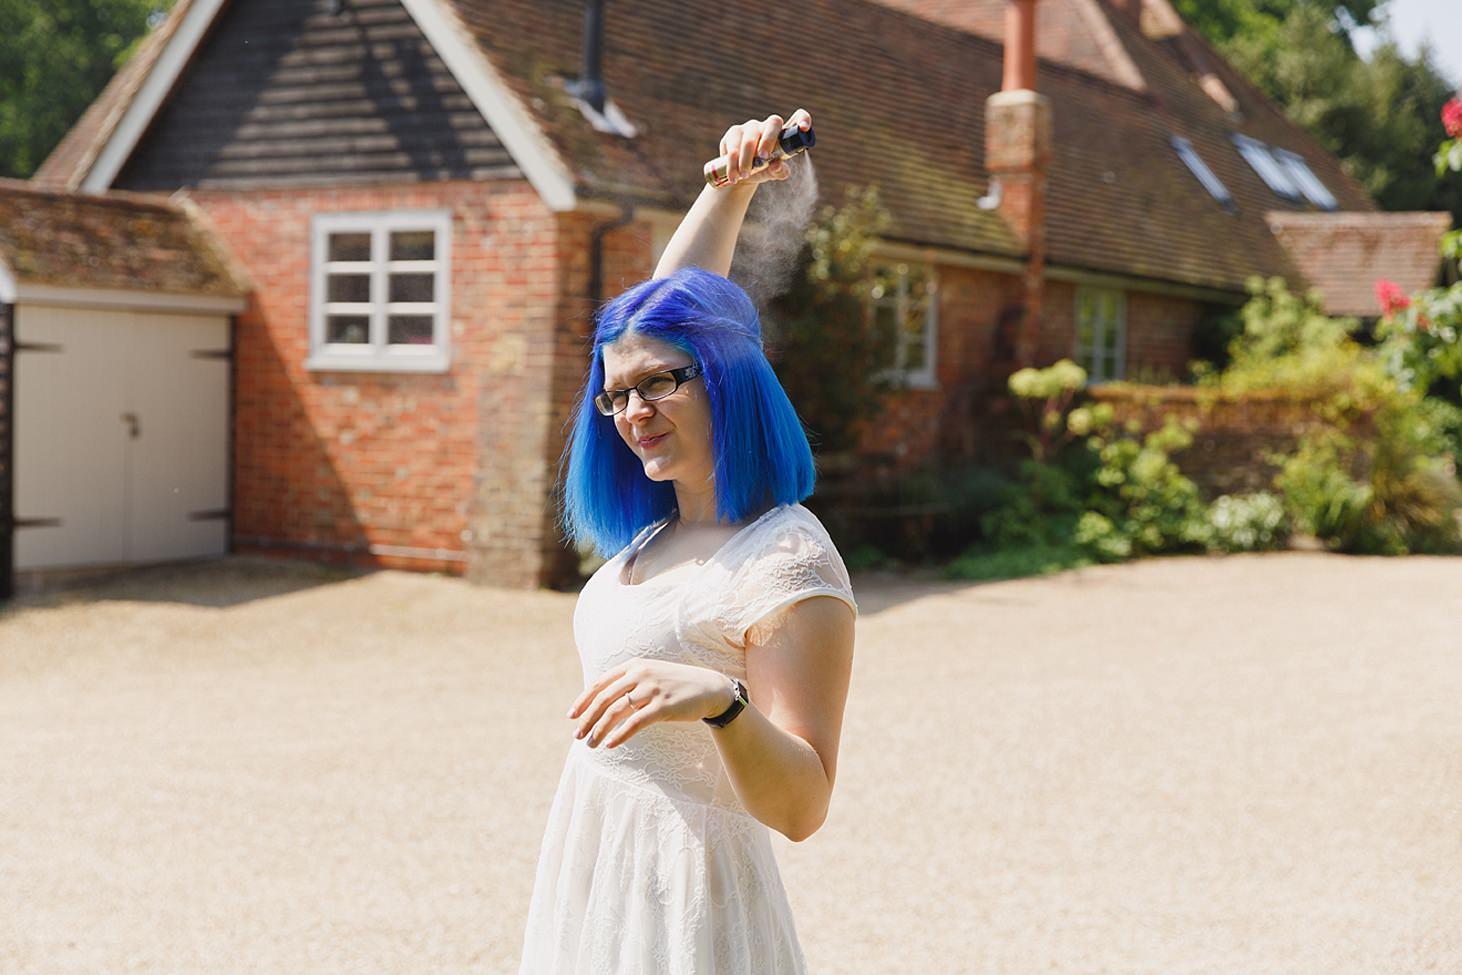 gate street barn wedding photography bride with hairspray